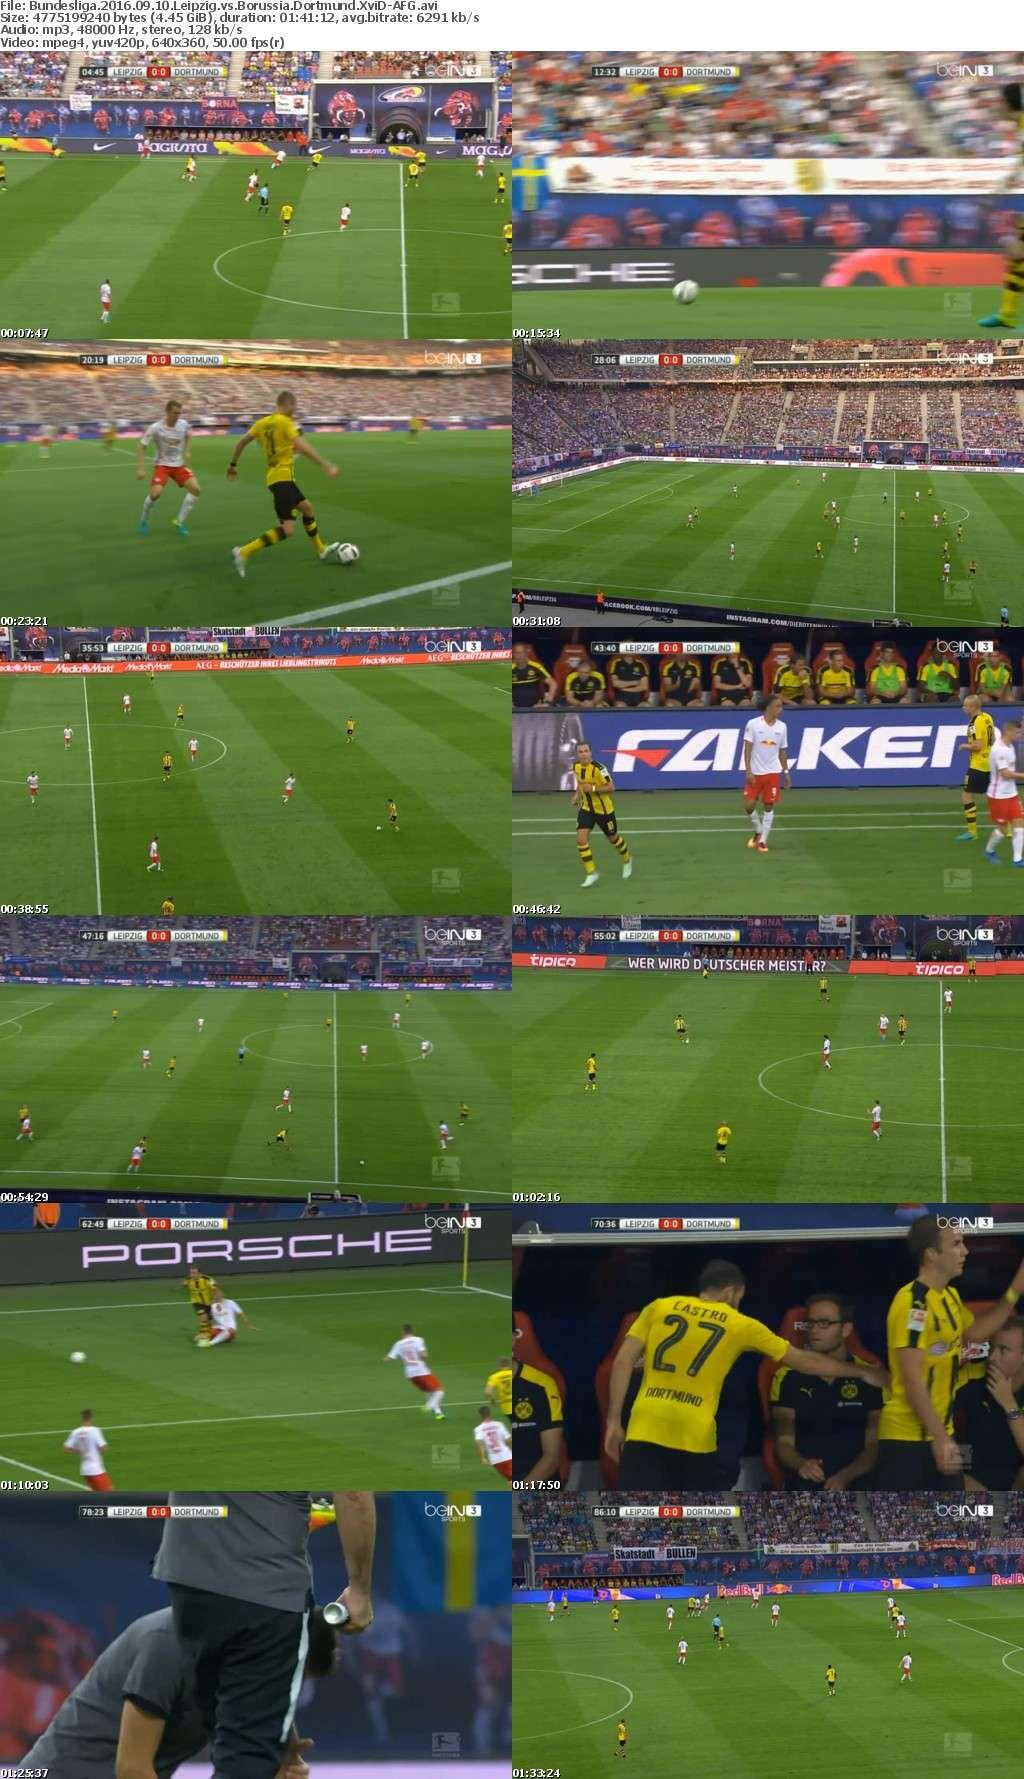 Bundesliga 2016 09 10 Leipzig vs Borussia Dortmund XviD-AFG